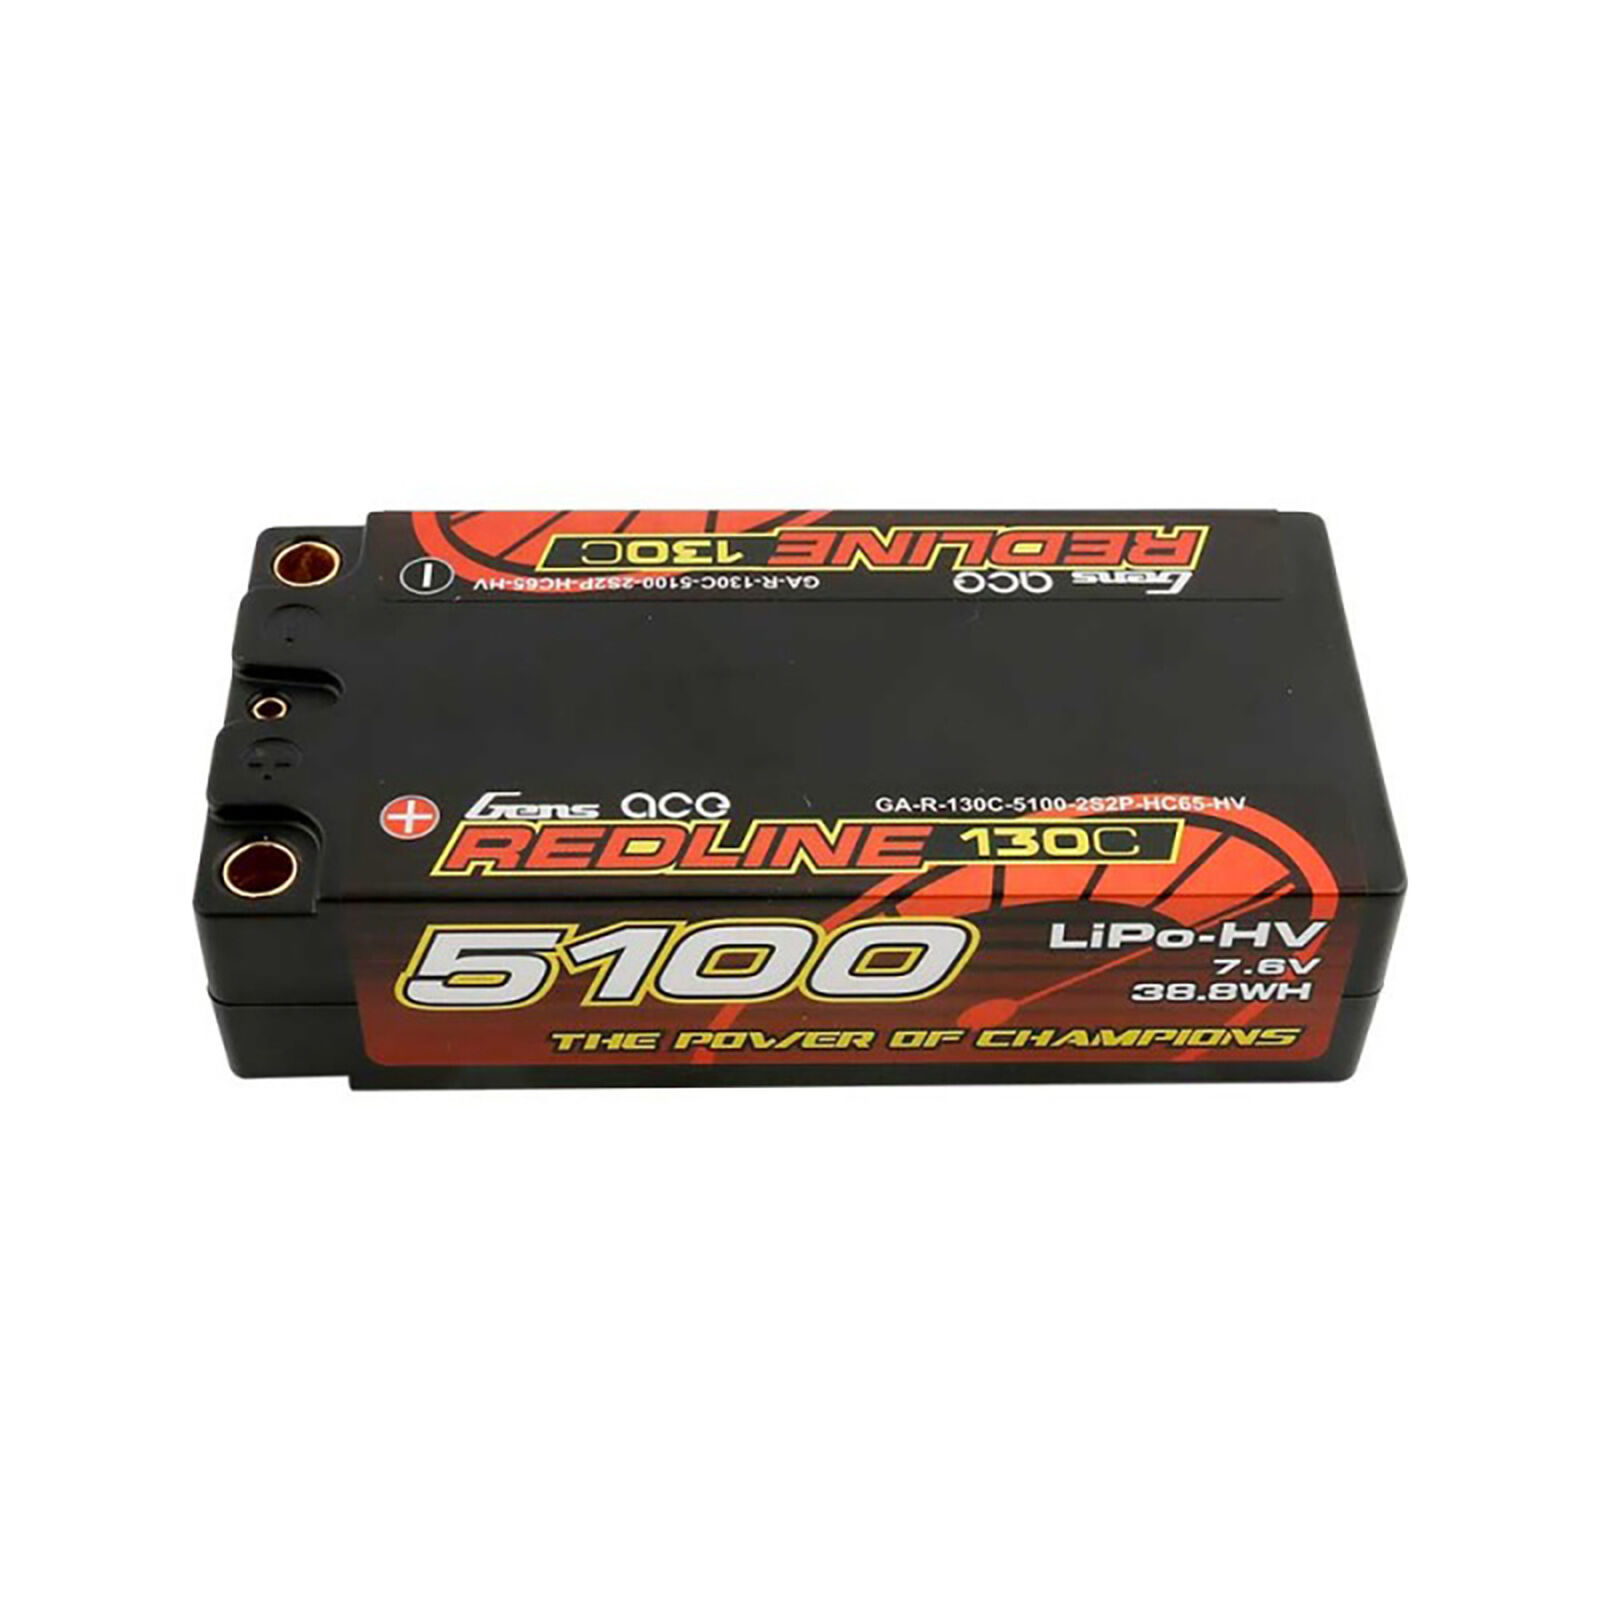 7.6V 5100mAh 2S 130C HV LiPo: 5.0mm Bullet